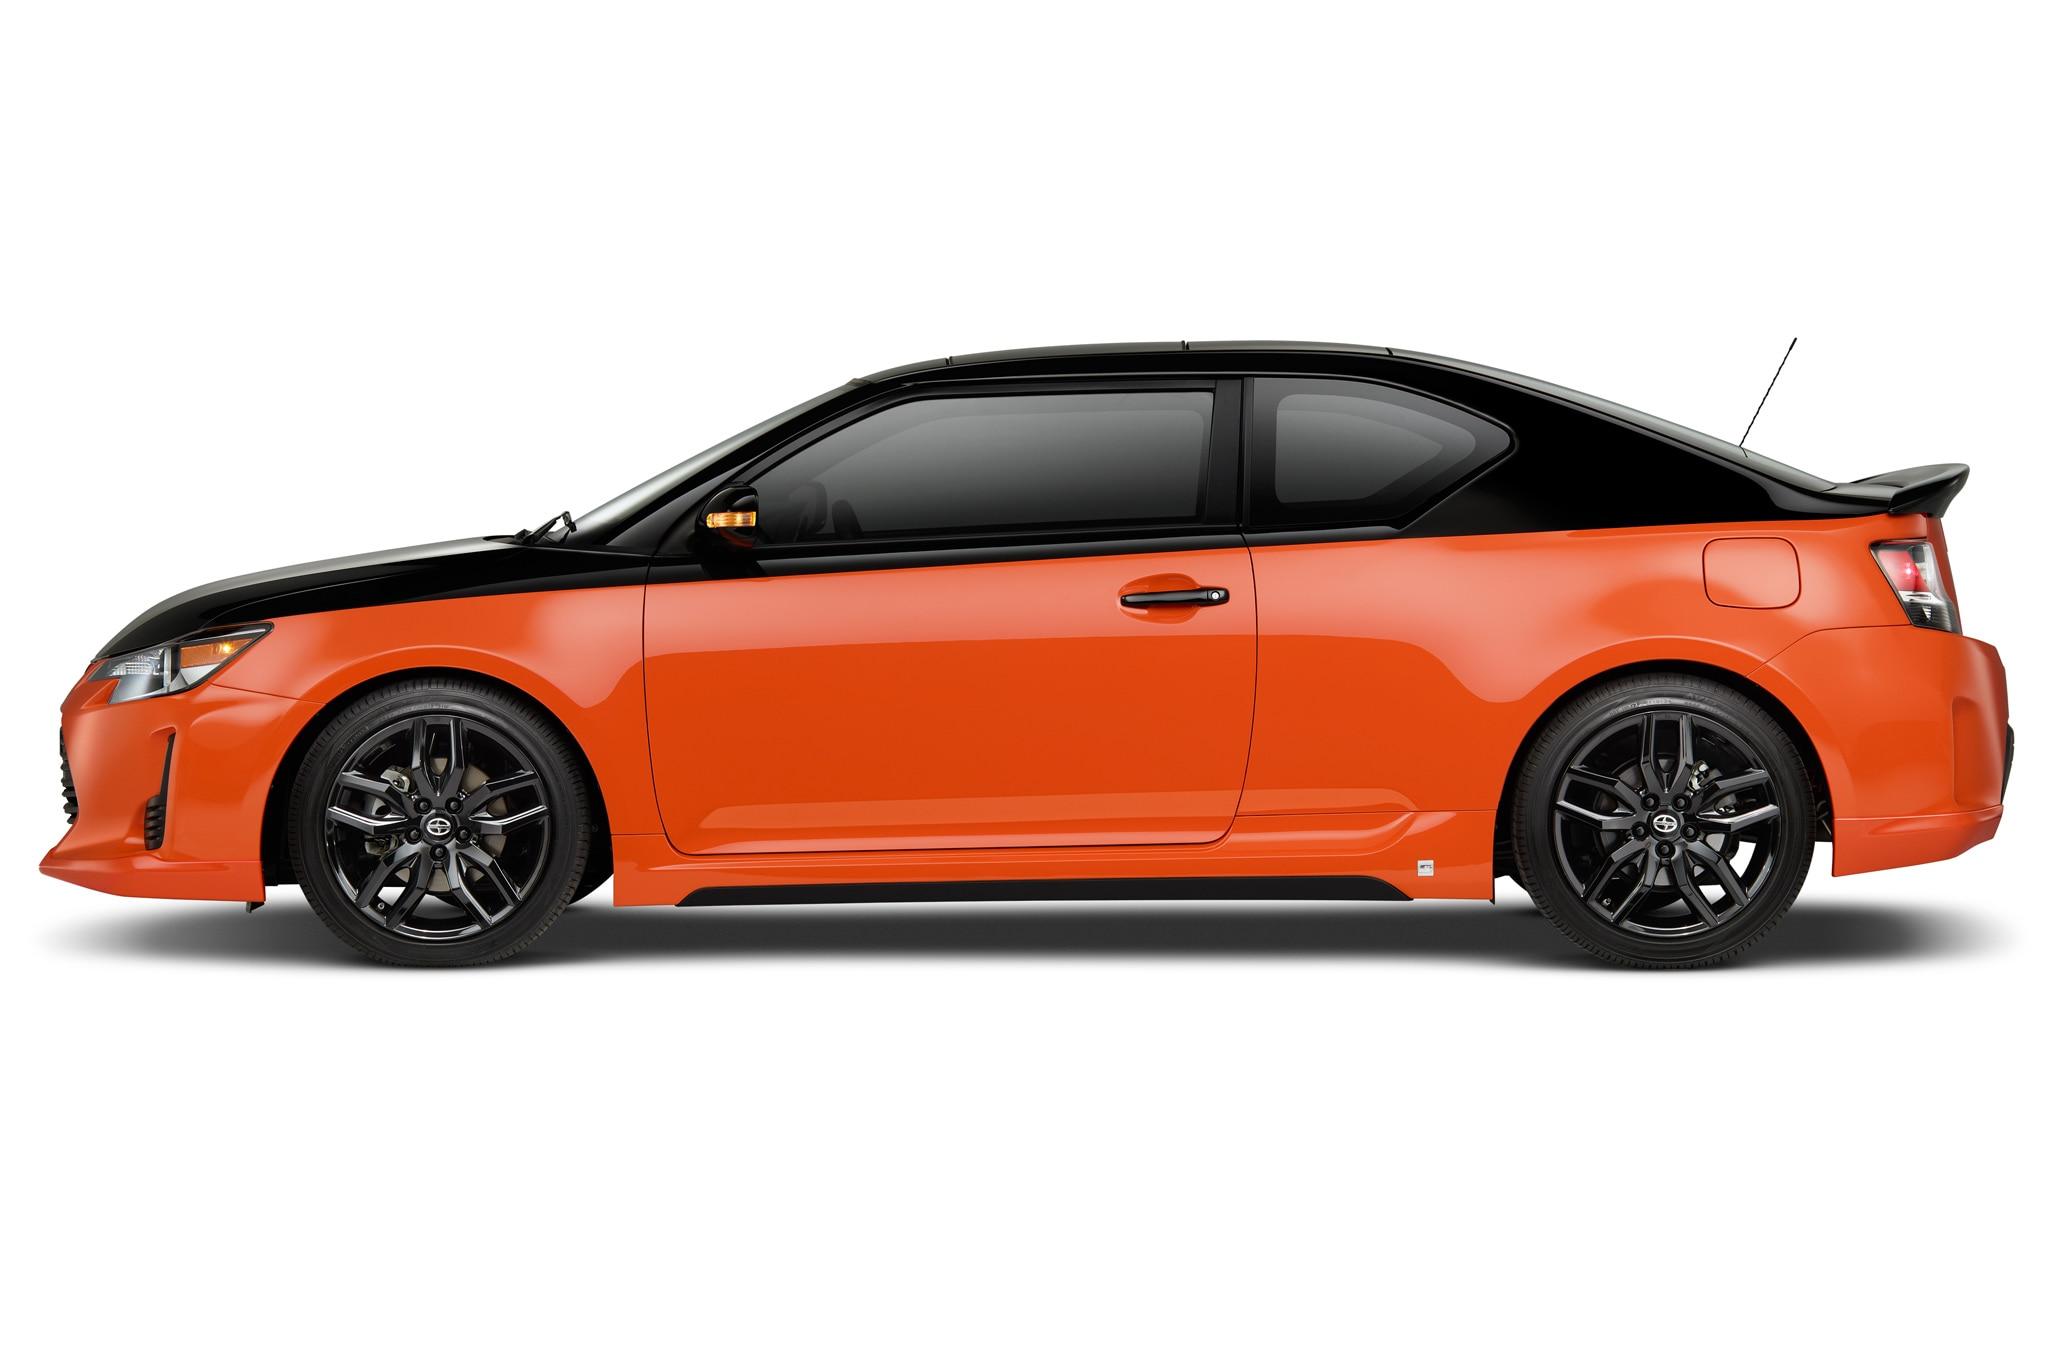 2015 Scion Tc Release Series 9 0 Announced